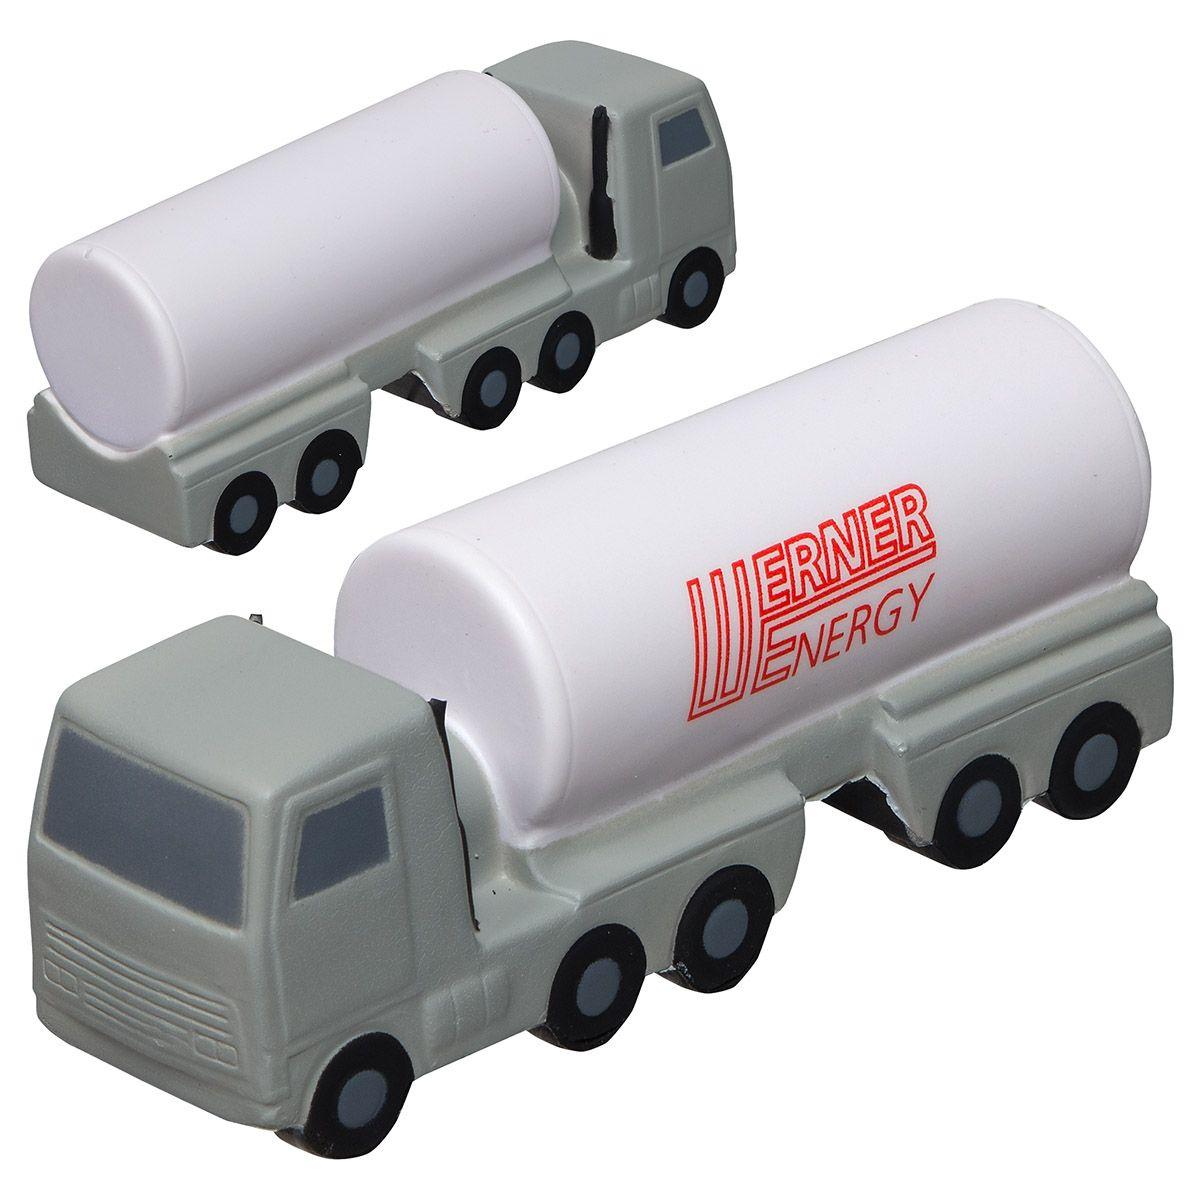 oil tanker stress toy